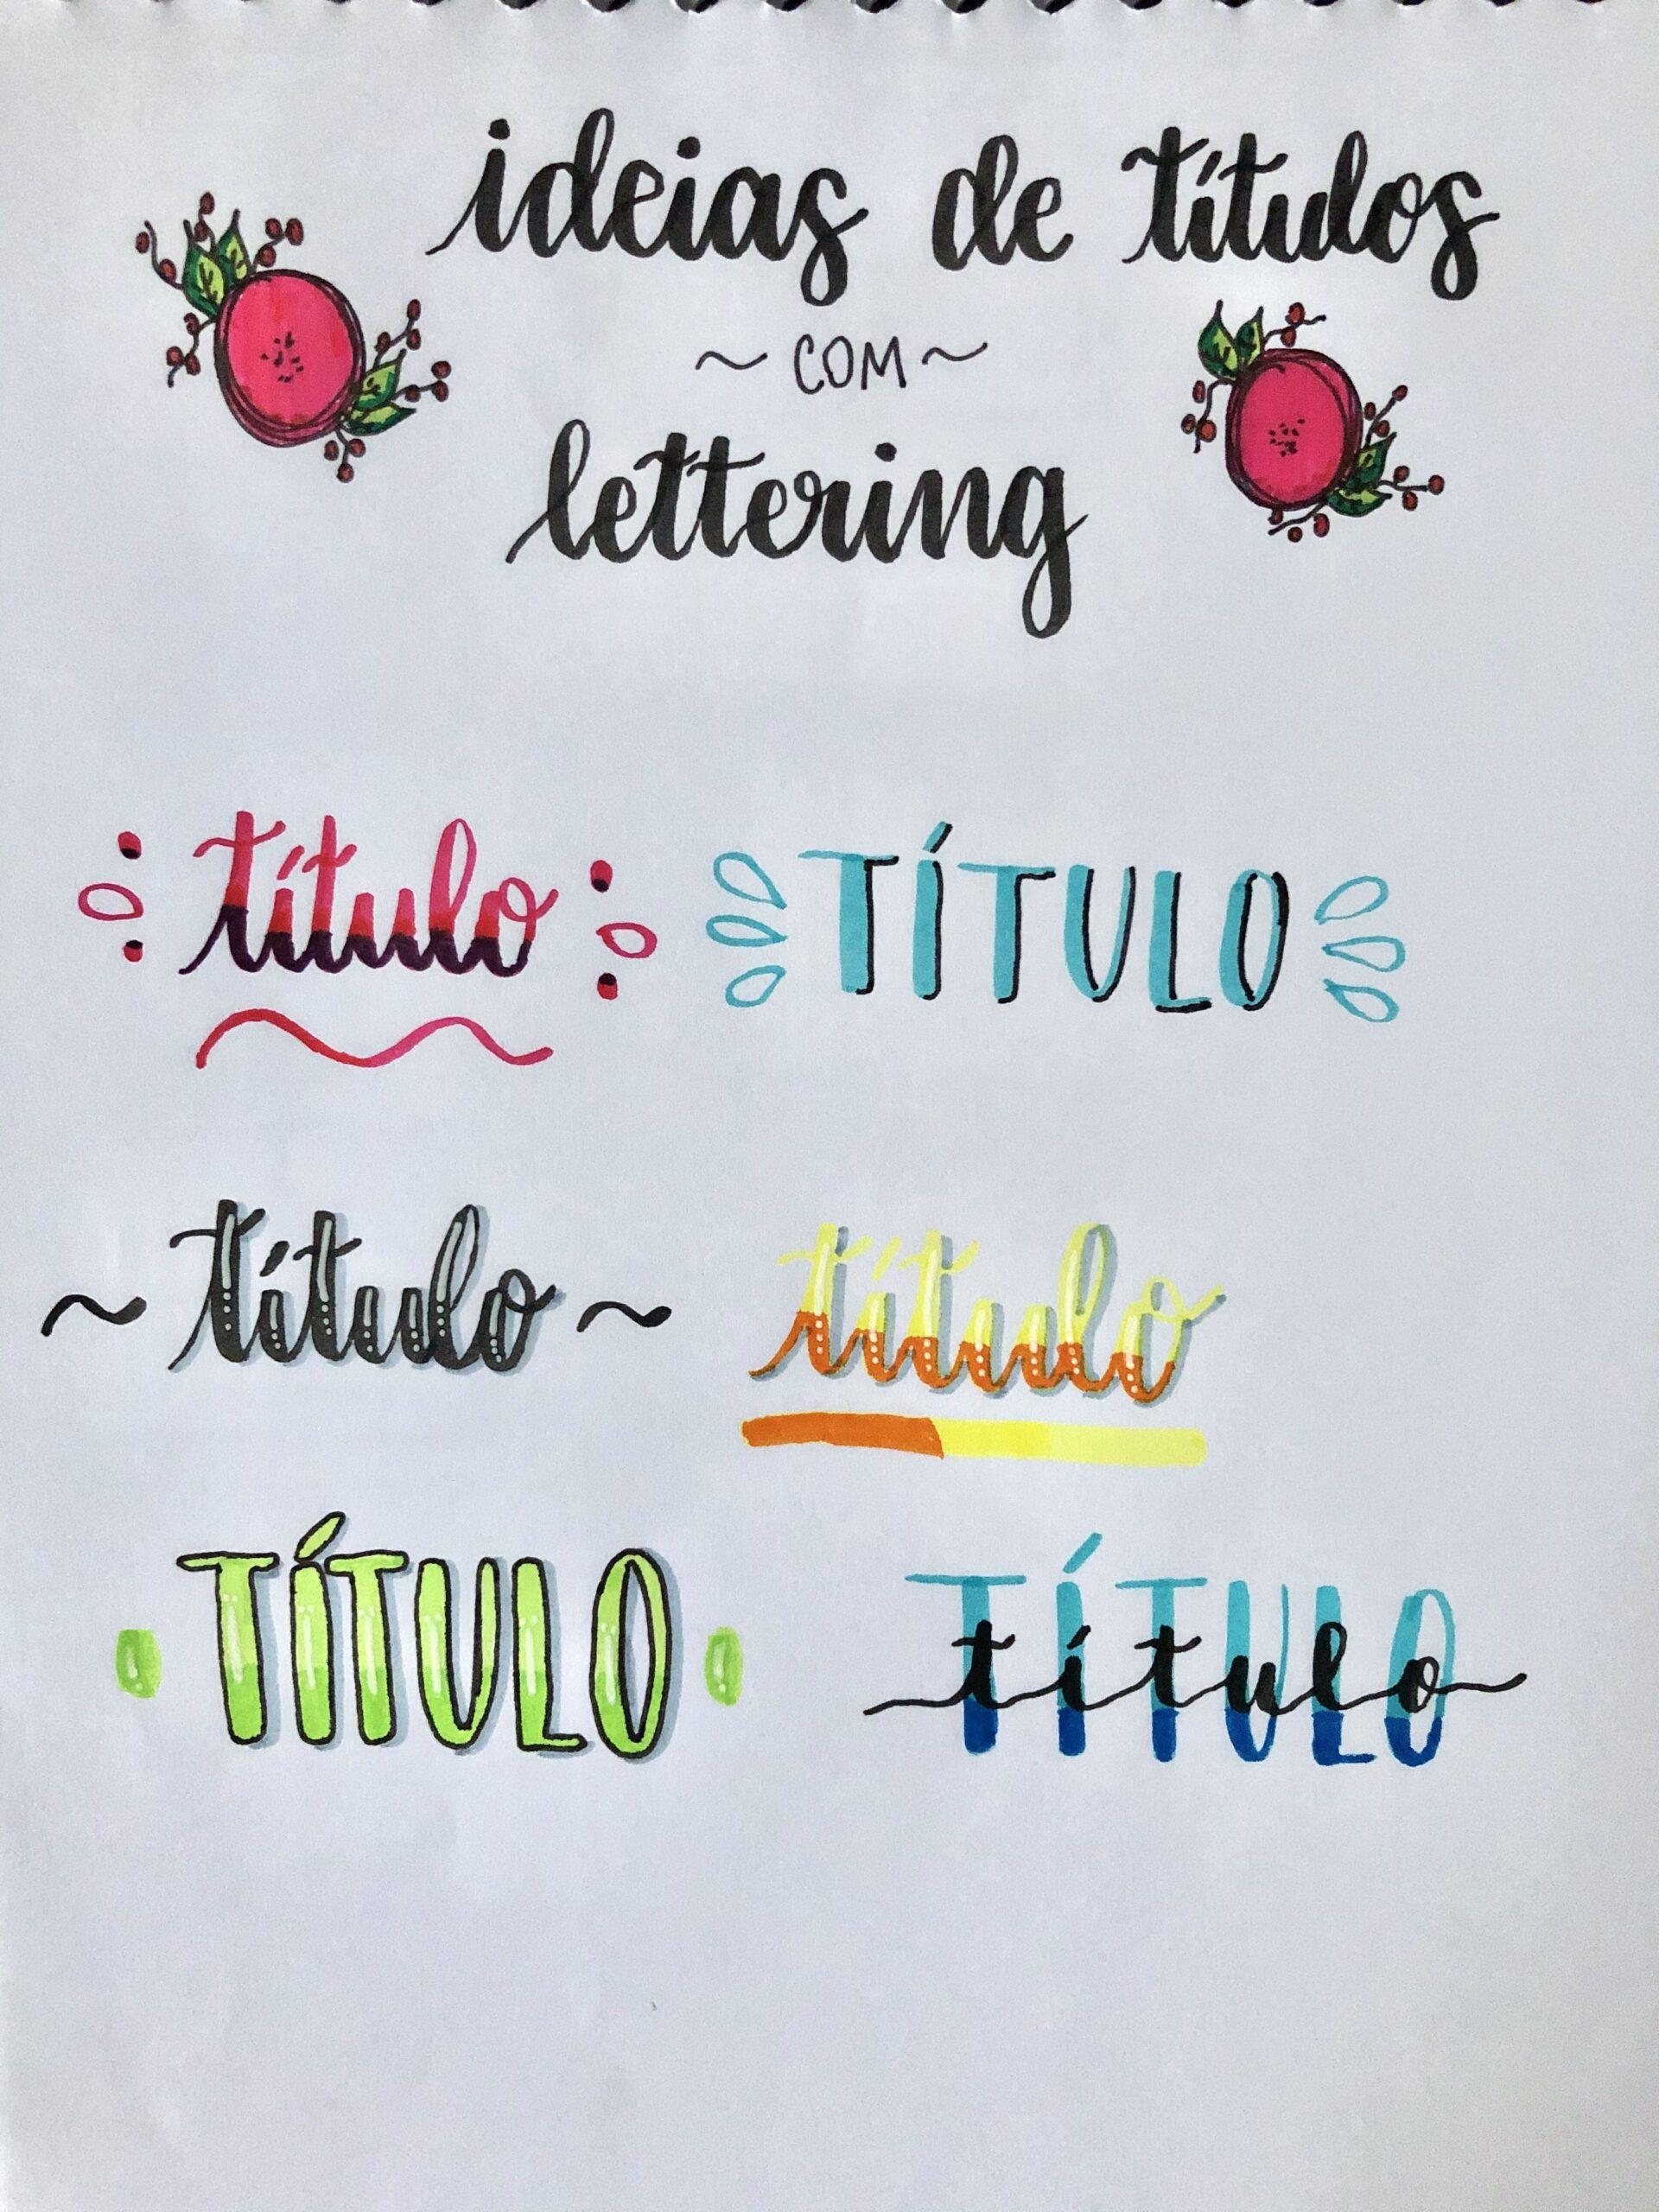 titulos con lettering scaled